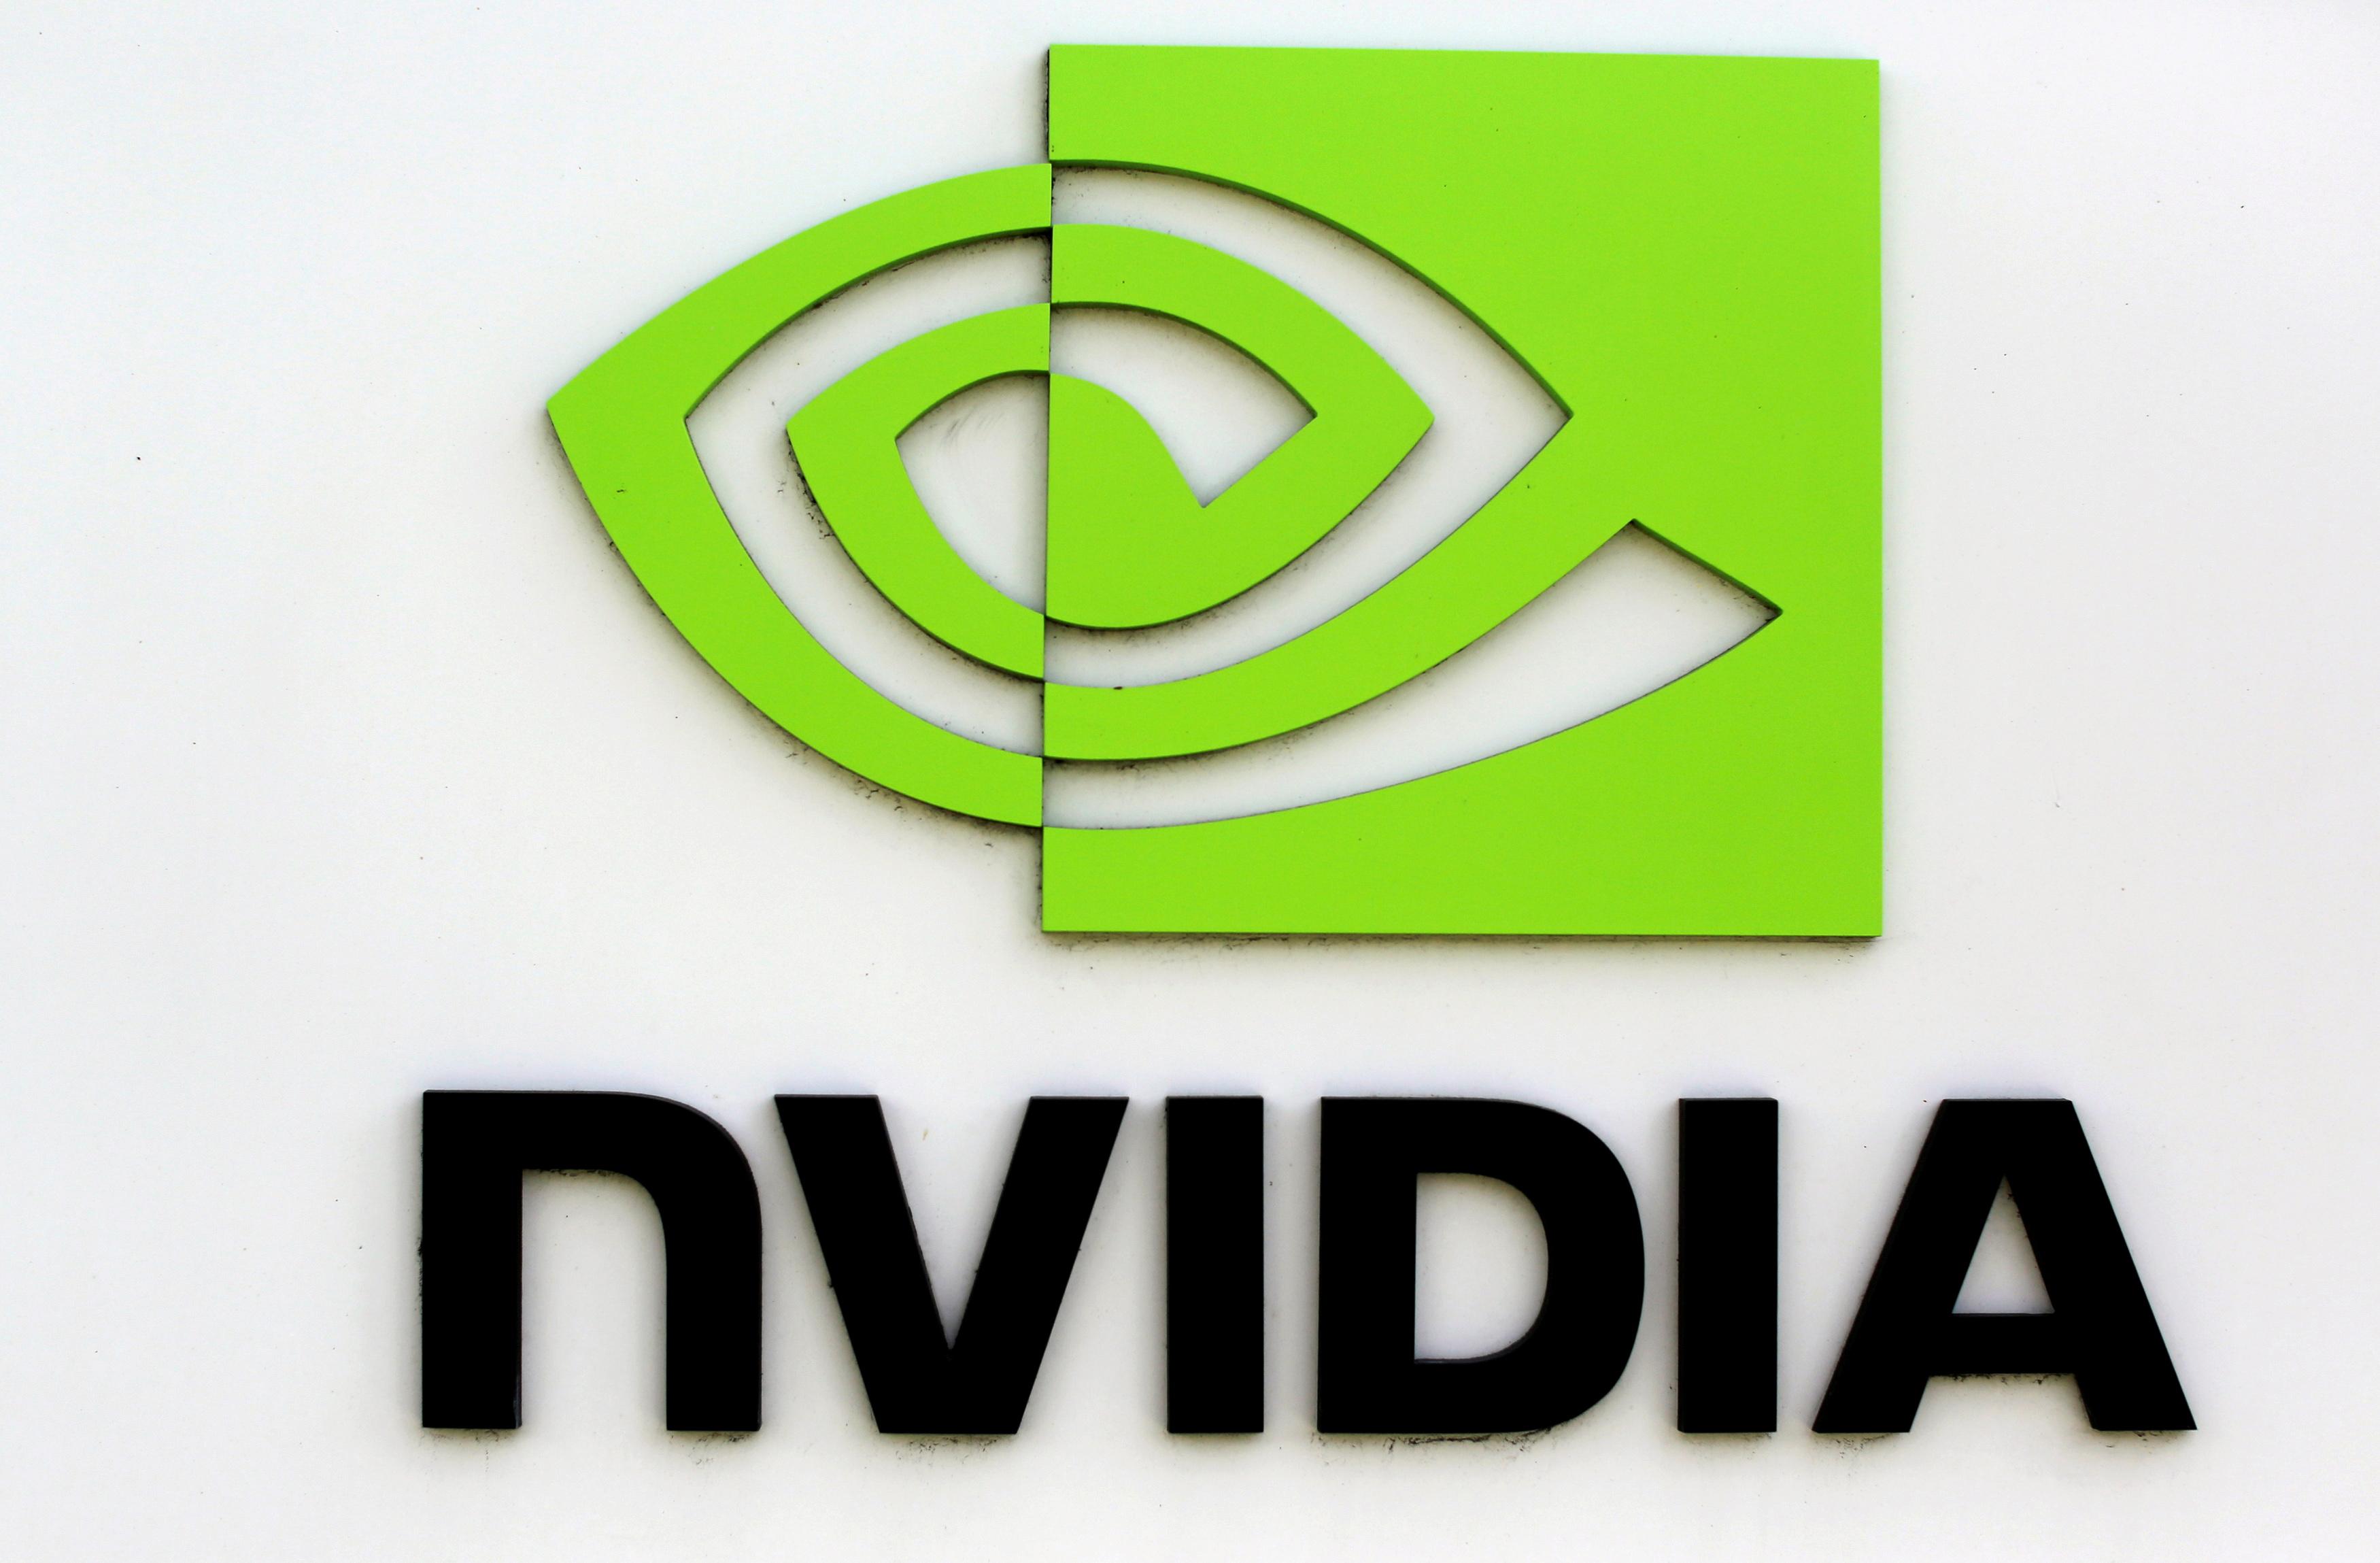 The logo of technology company Nvidia is seen at its headquarters in Santa Clara, California February 11, 2015. . REUTERS/Robert Galbraith